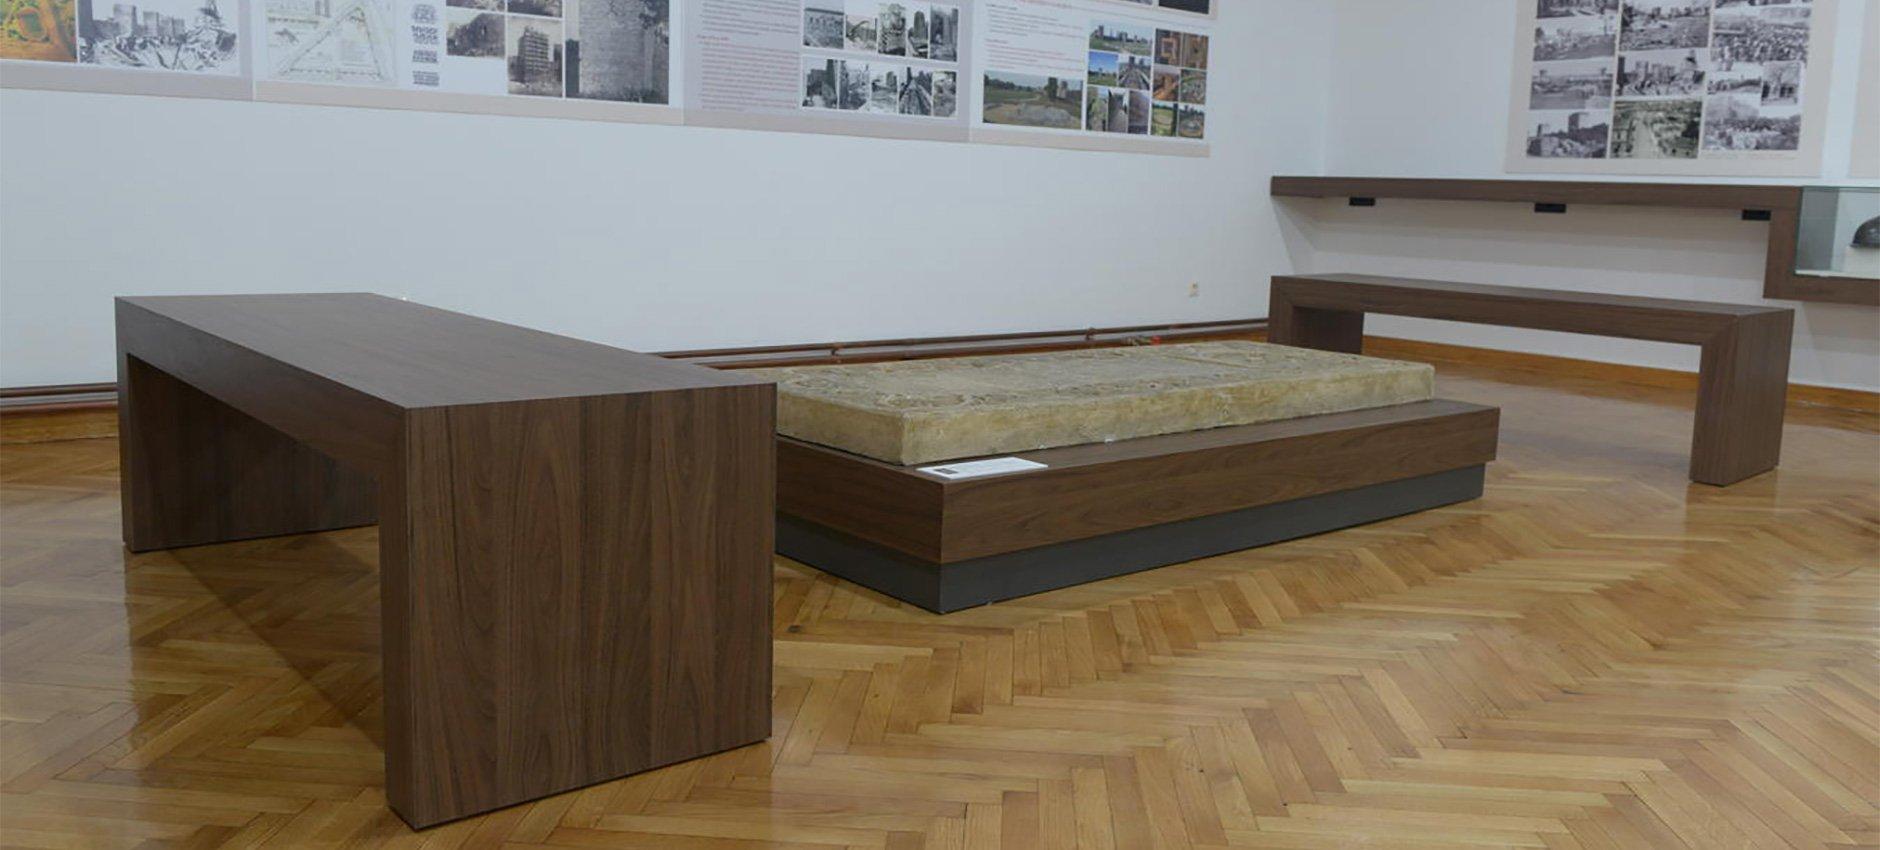 smederevo-muzej-5.jpg